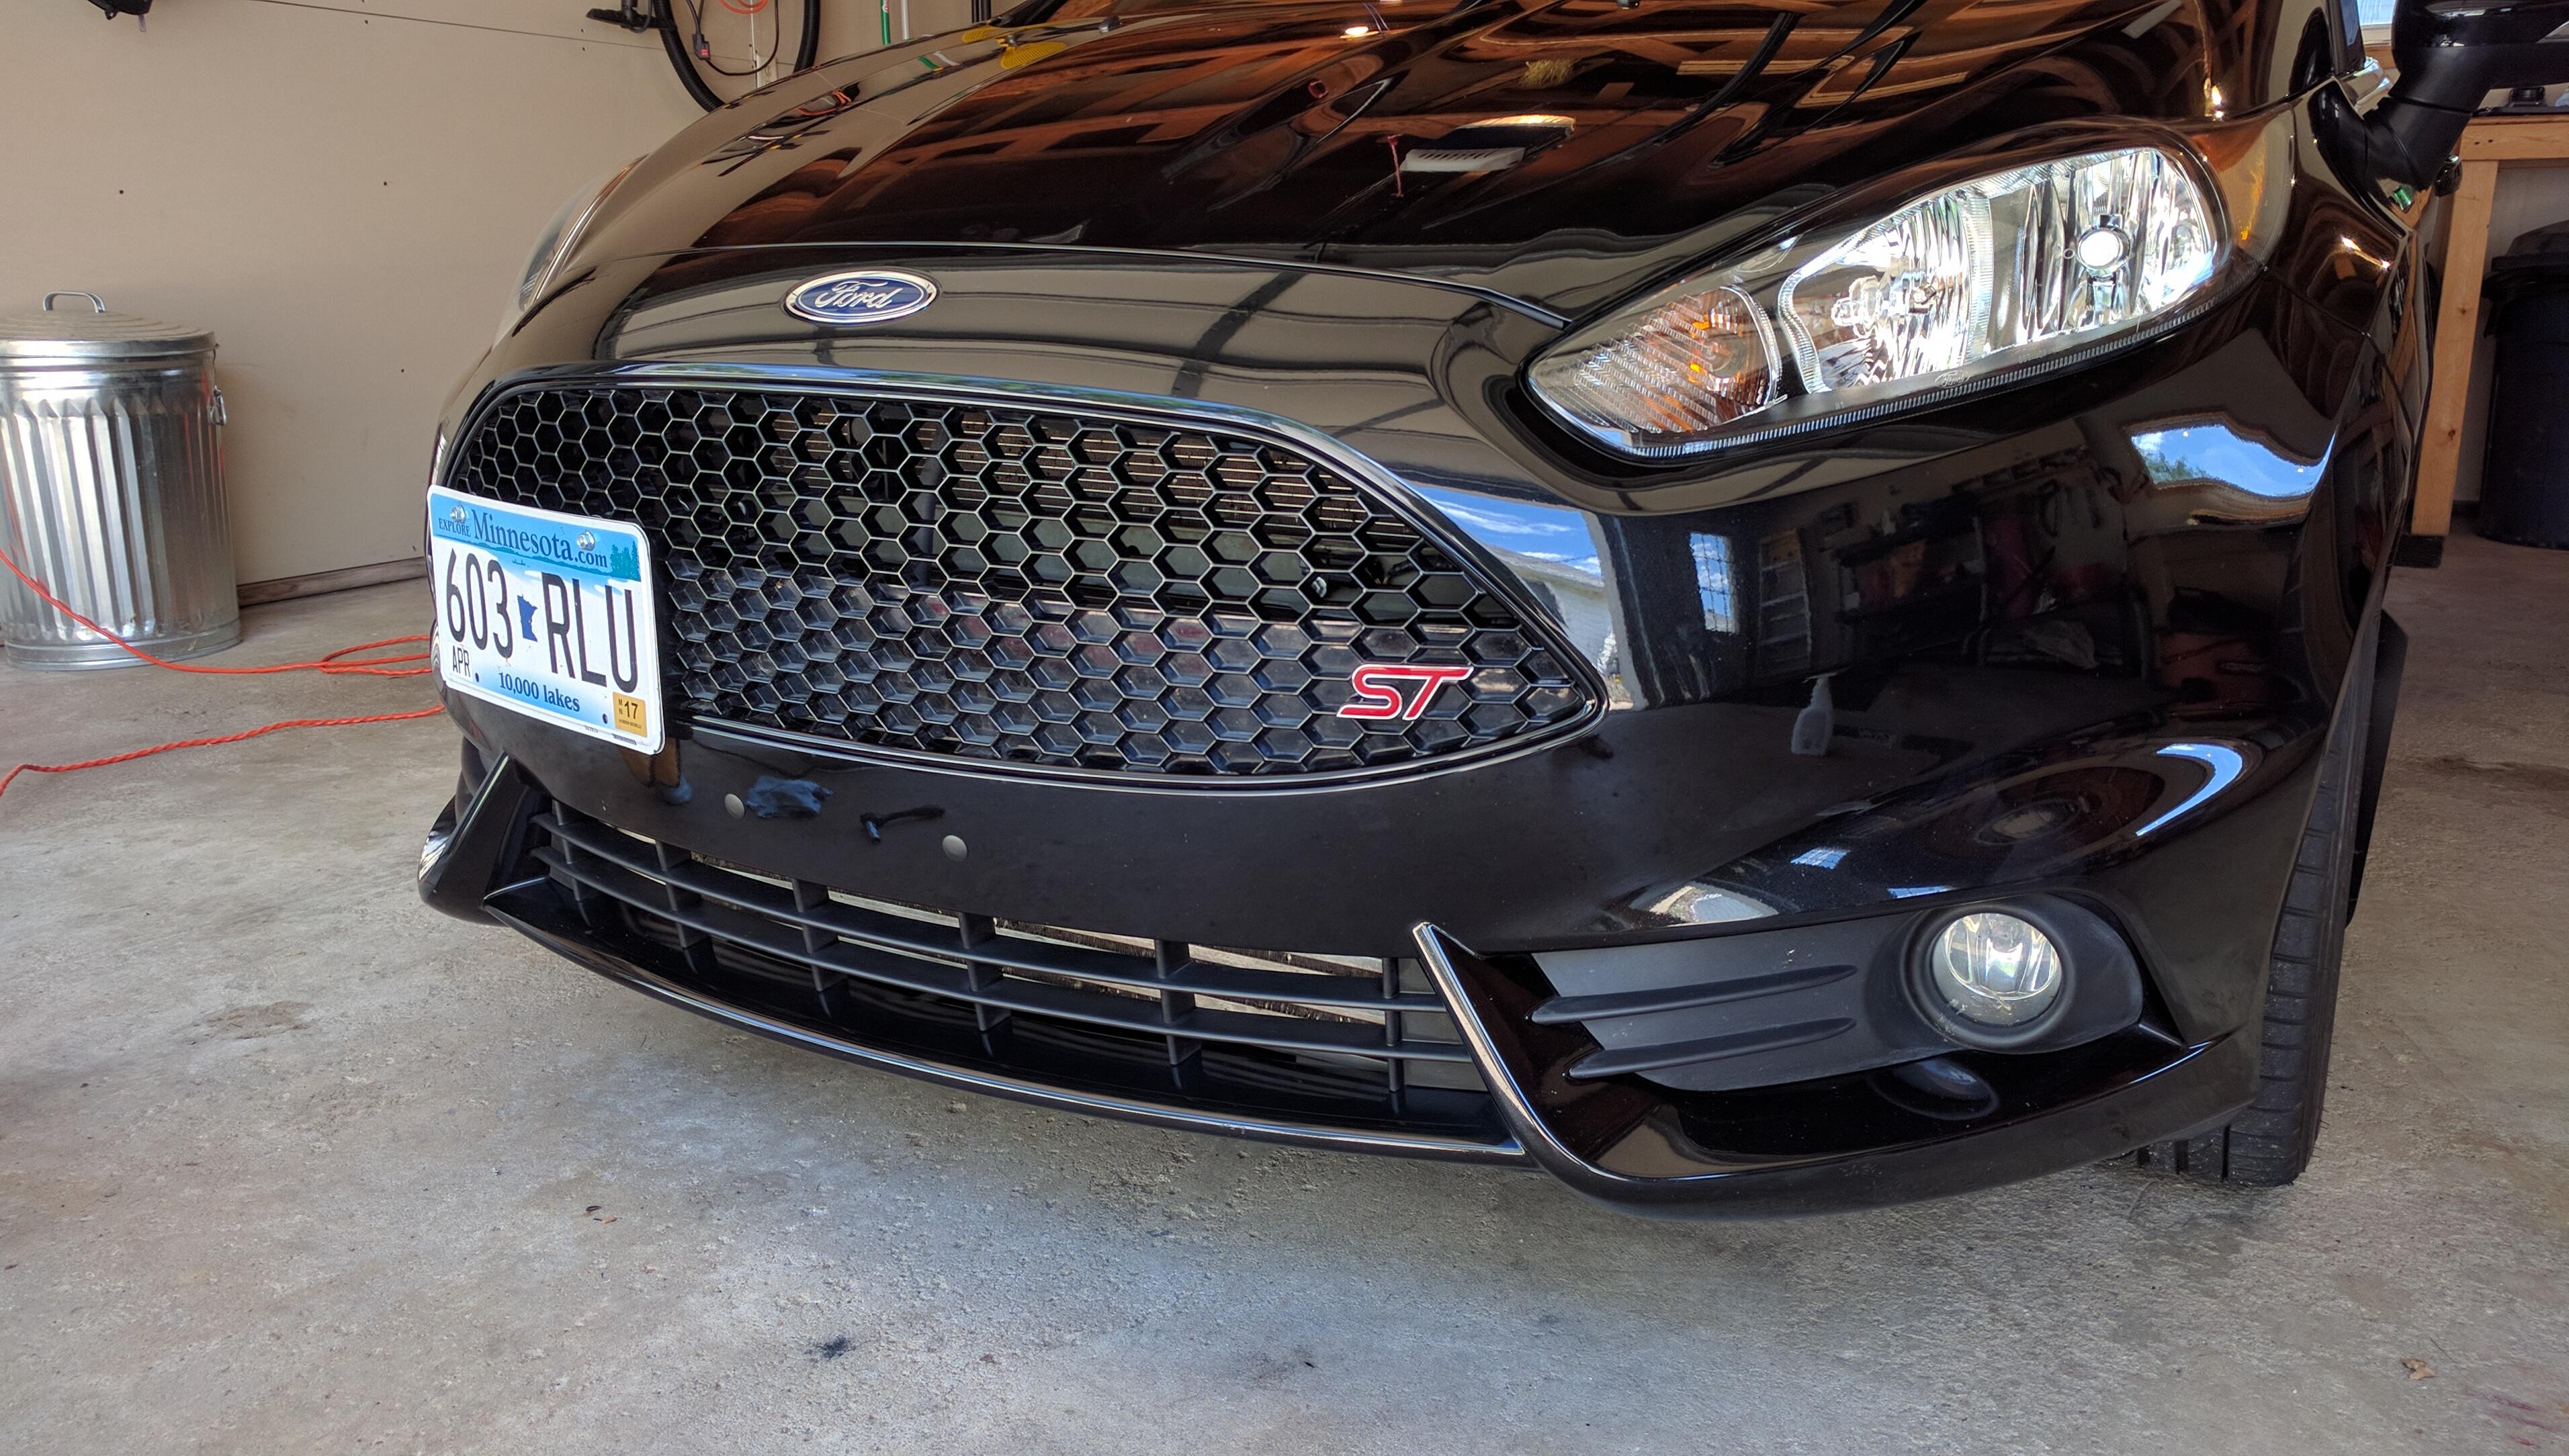 Fiesta ST front bumper